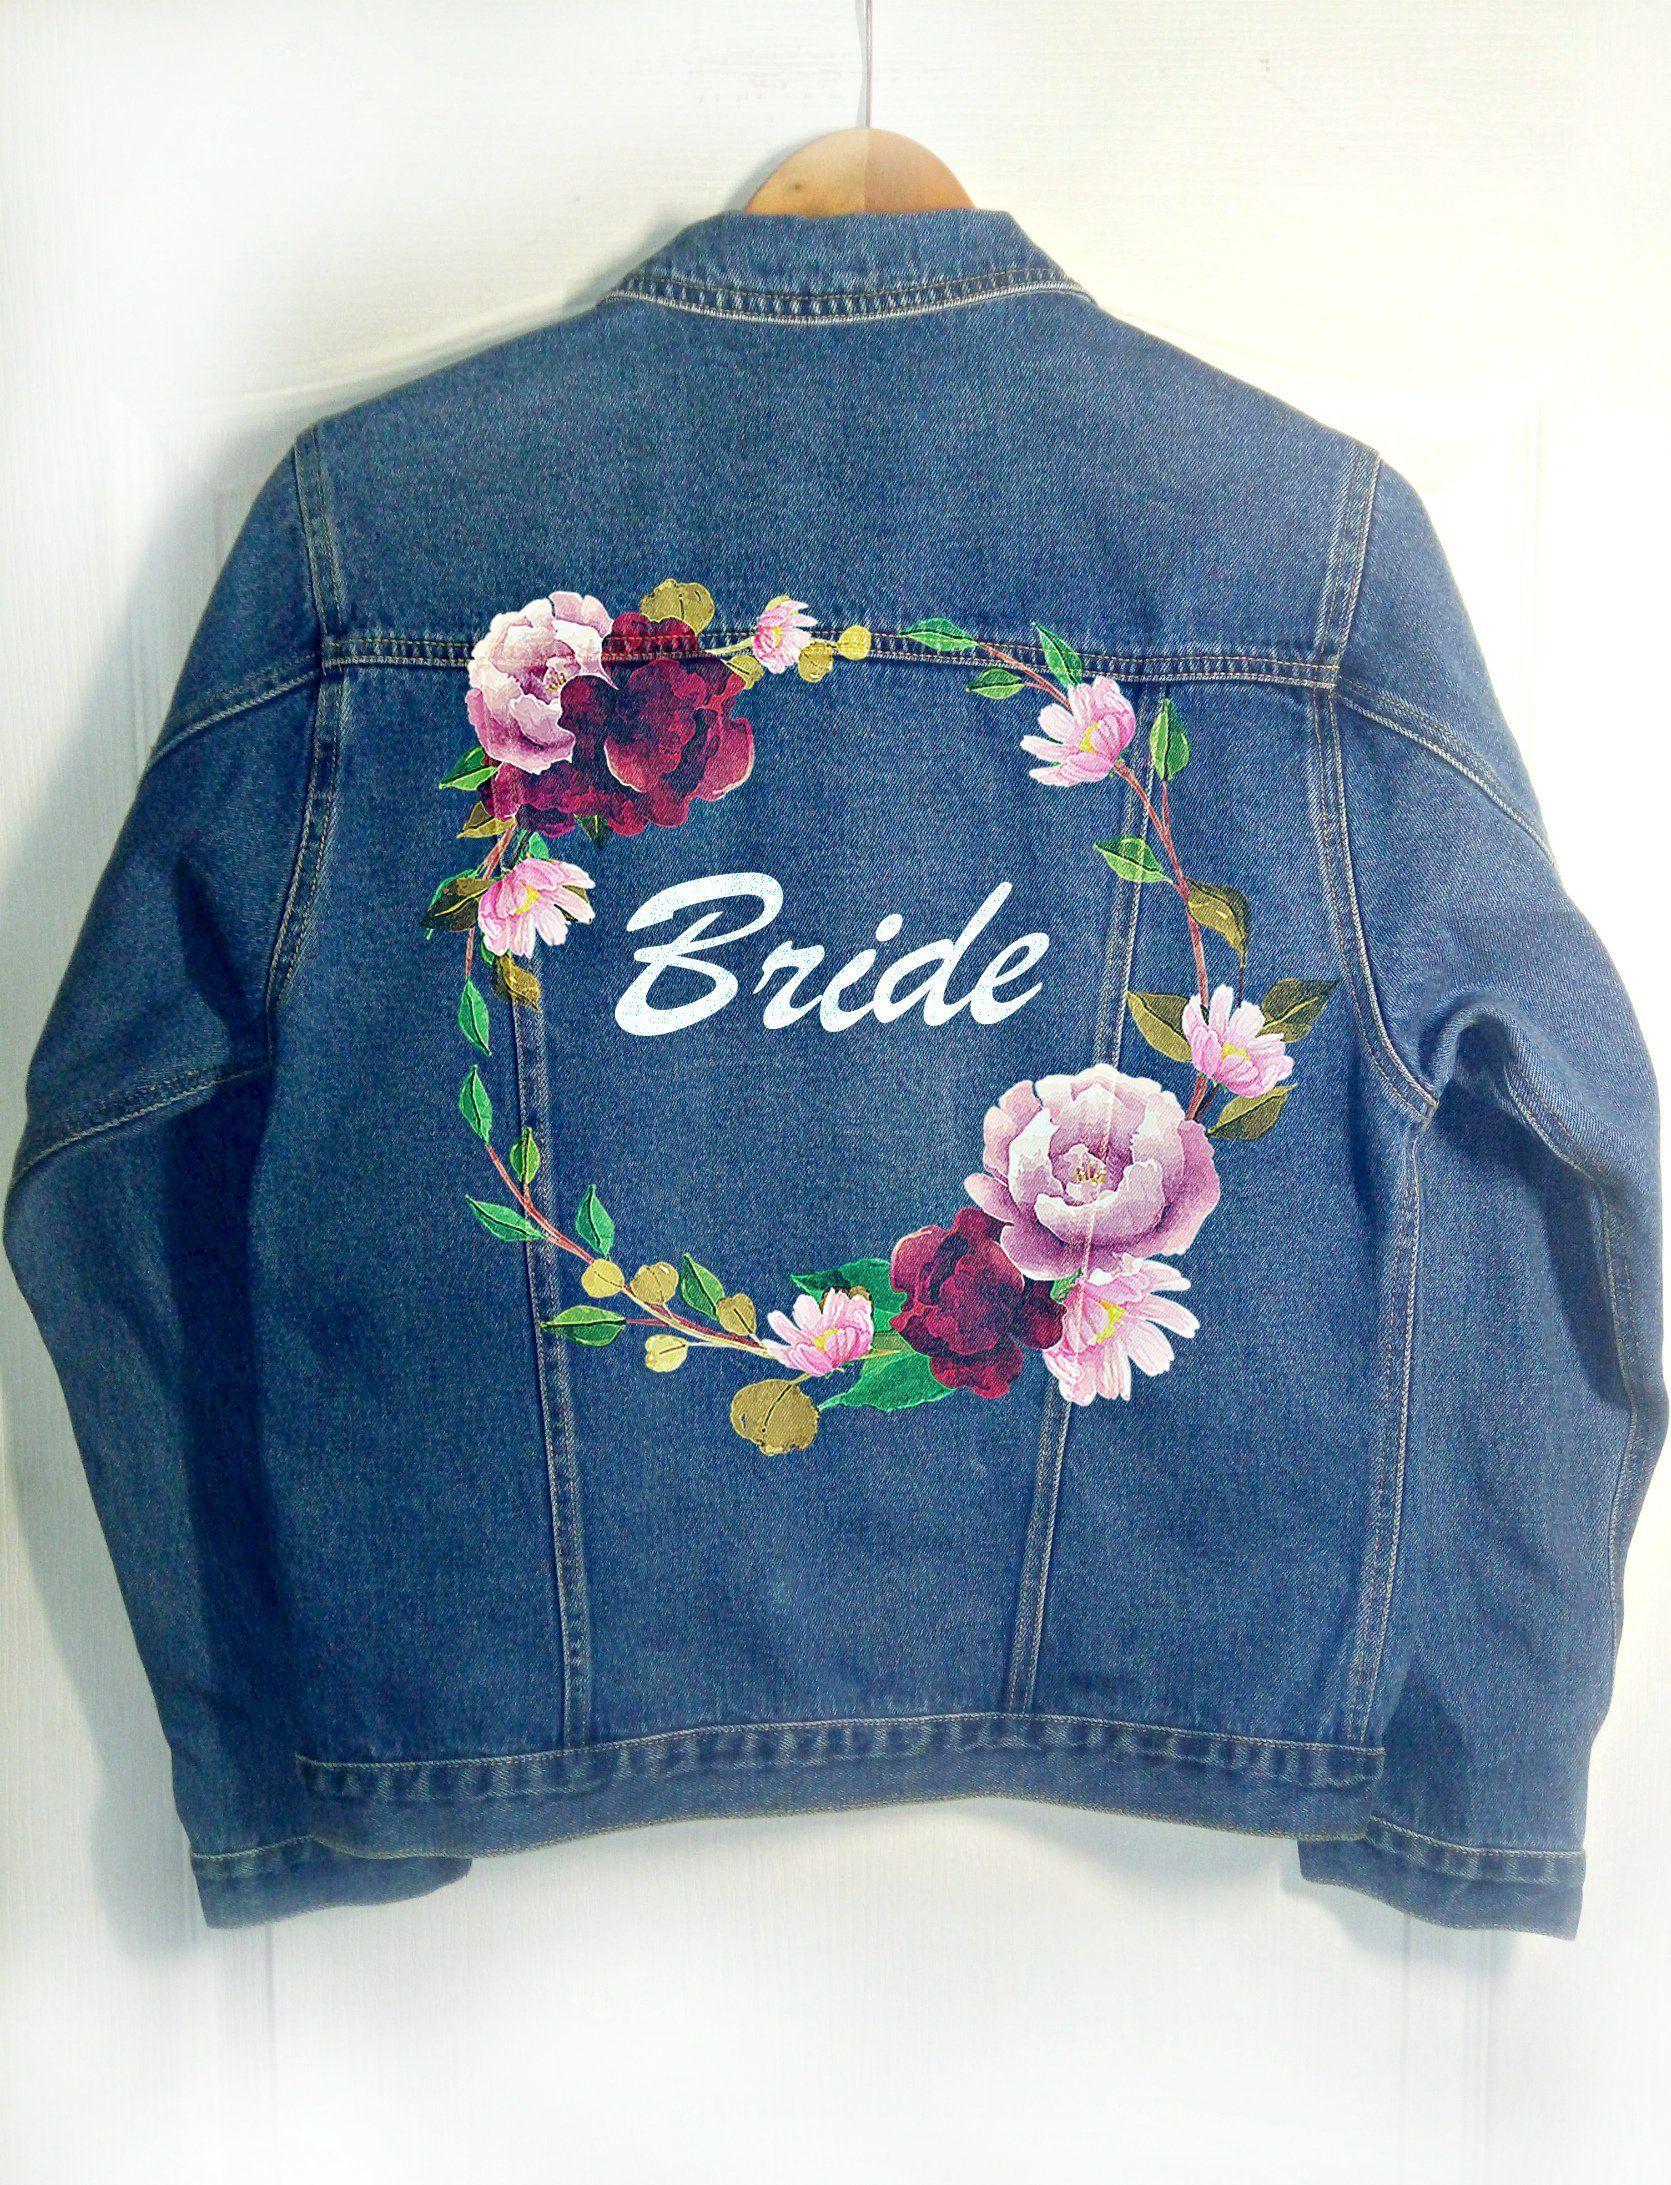 Hand Painted Wedding Denim Jacket Etsy Diy Denim Jacket Embroidery Jeans Jacket Painted Denim [ 2185 x 1671 Pixel ]